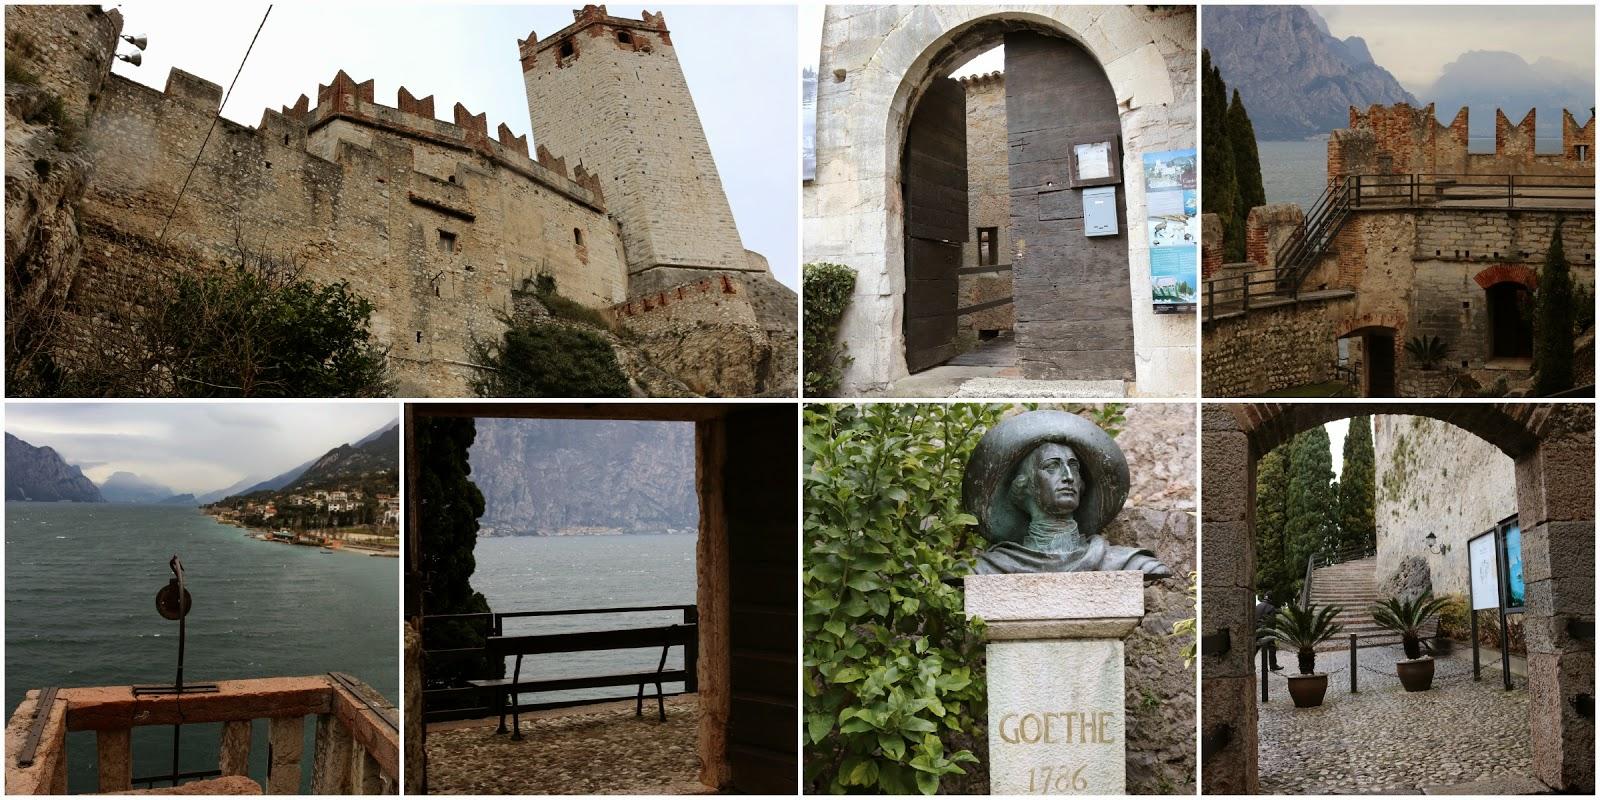 Italien, Gardasee, Wein, Olivenöl, Custoza, Skaligerburg, Monte Baldo, Malcesine, Aqualux Hotel, Bardolino, Goethe